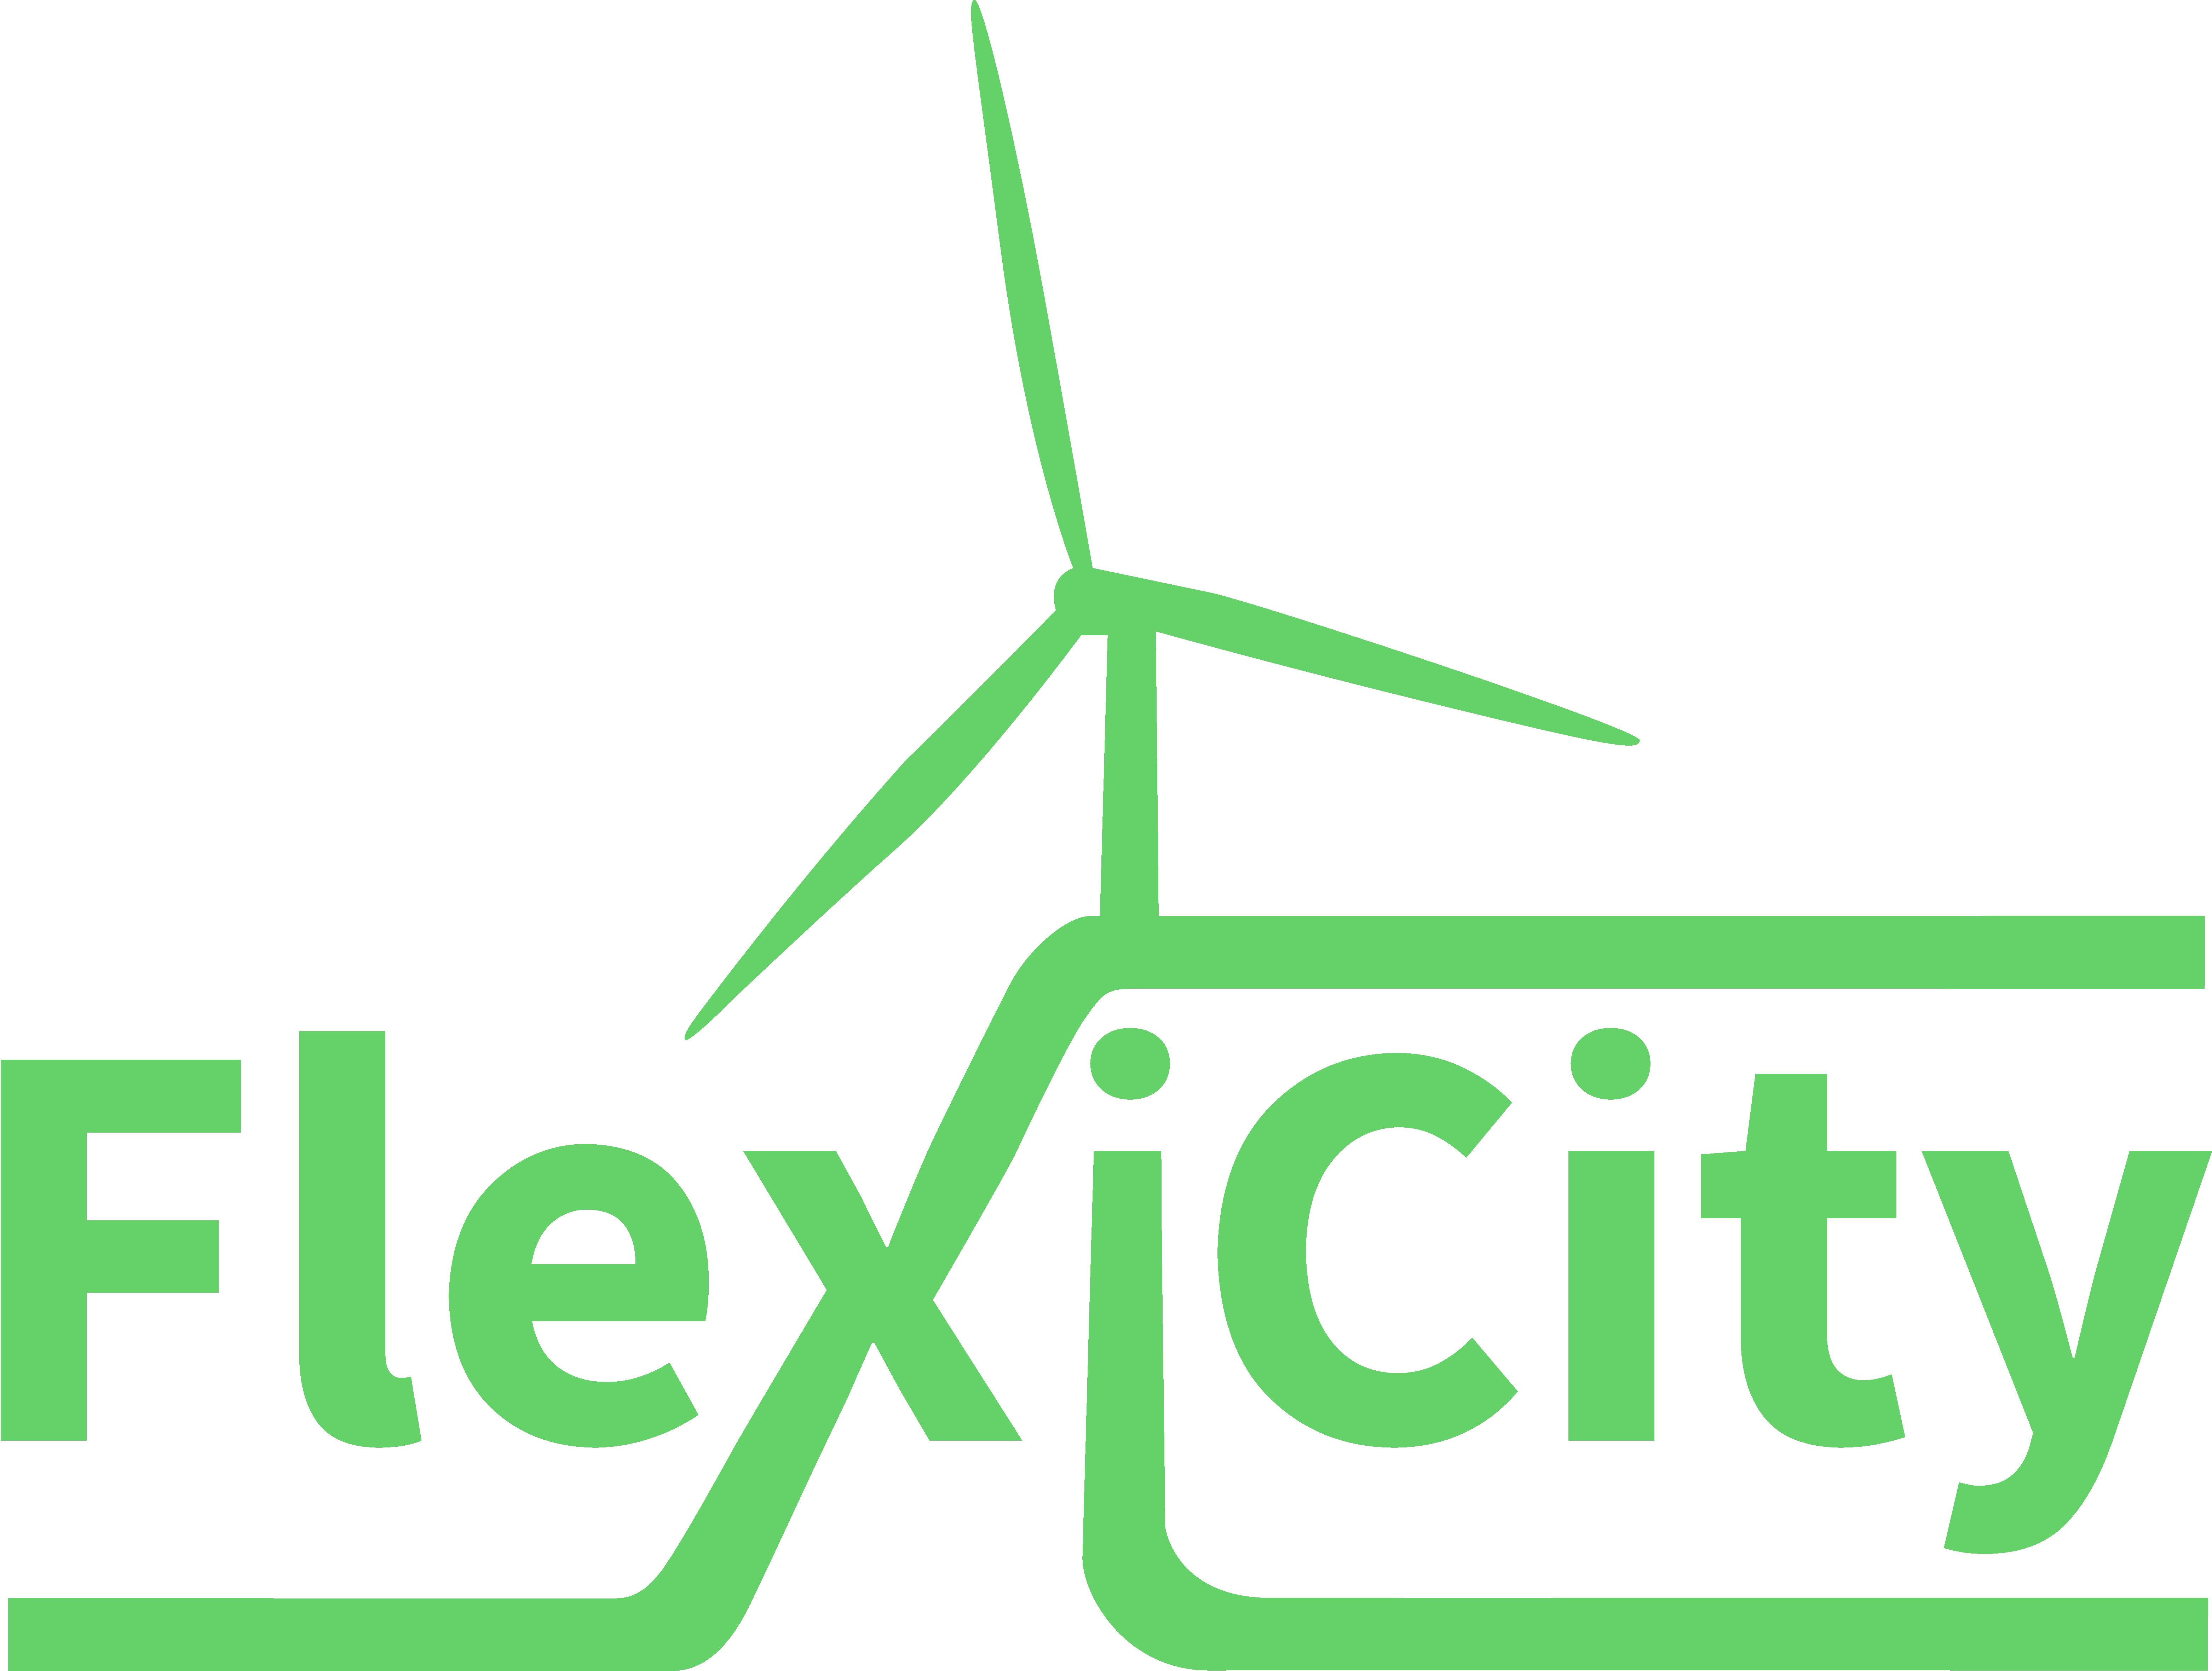 FlexiCity